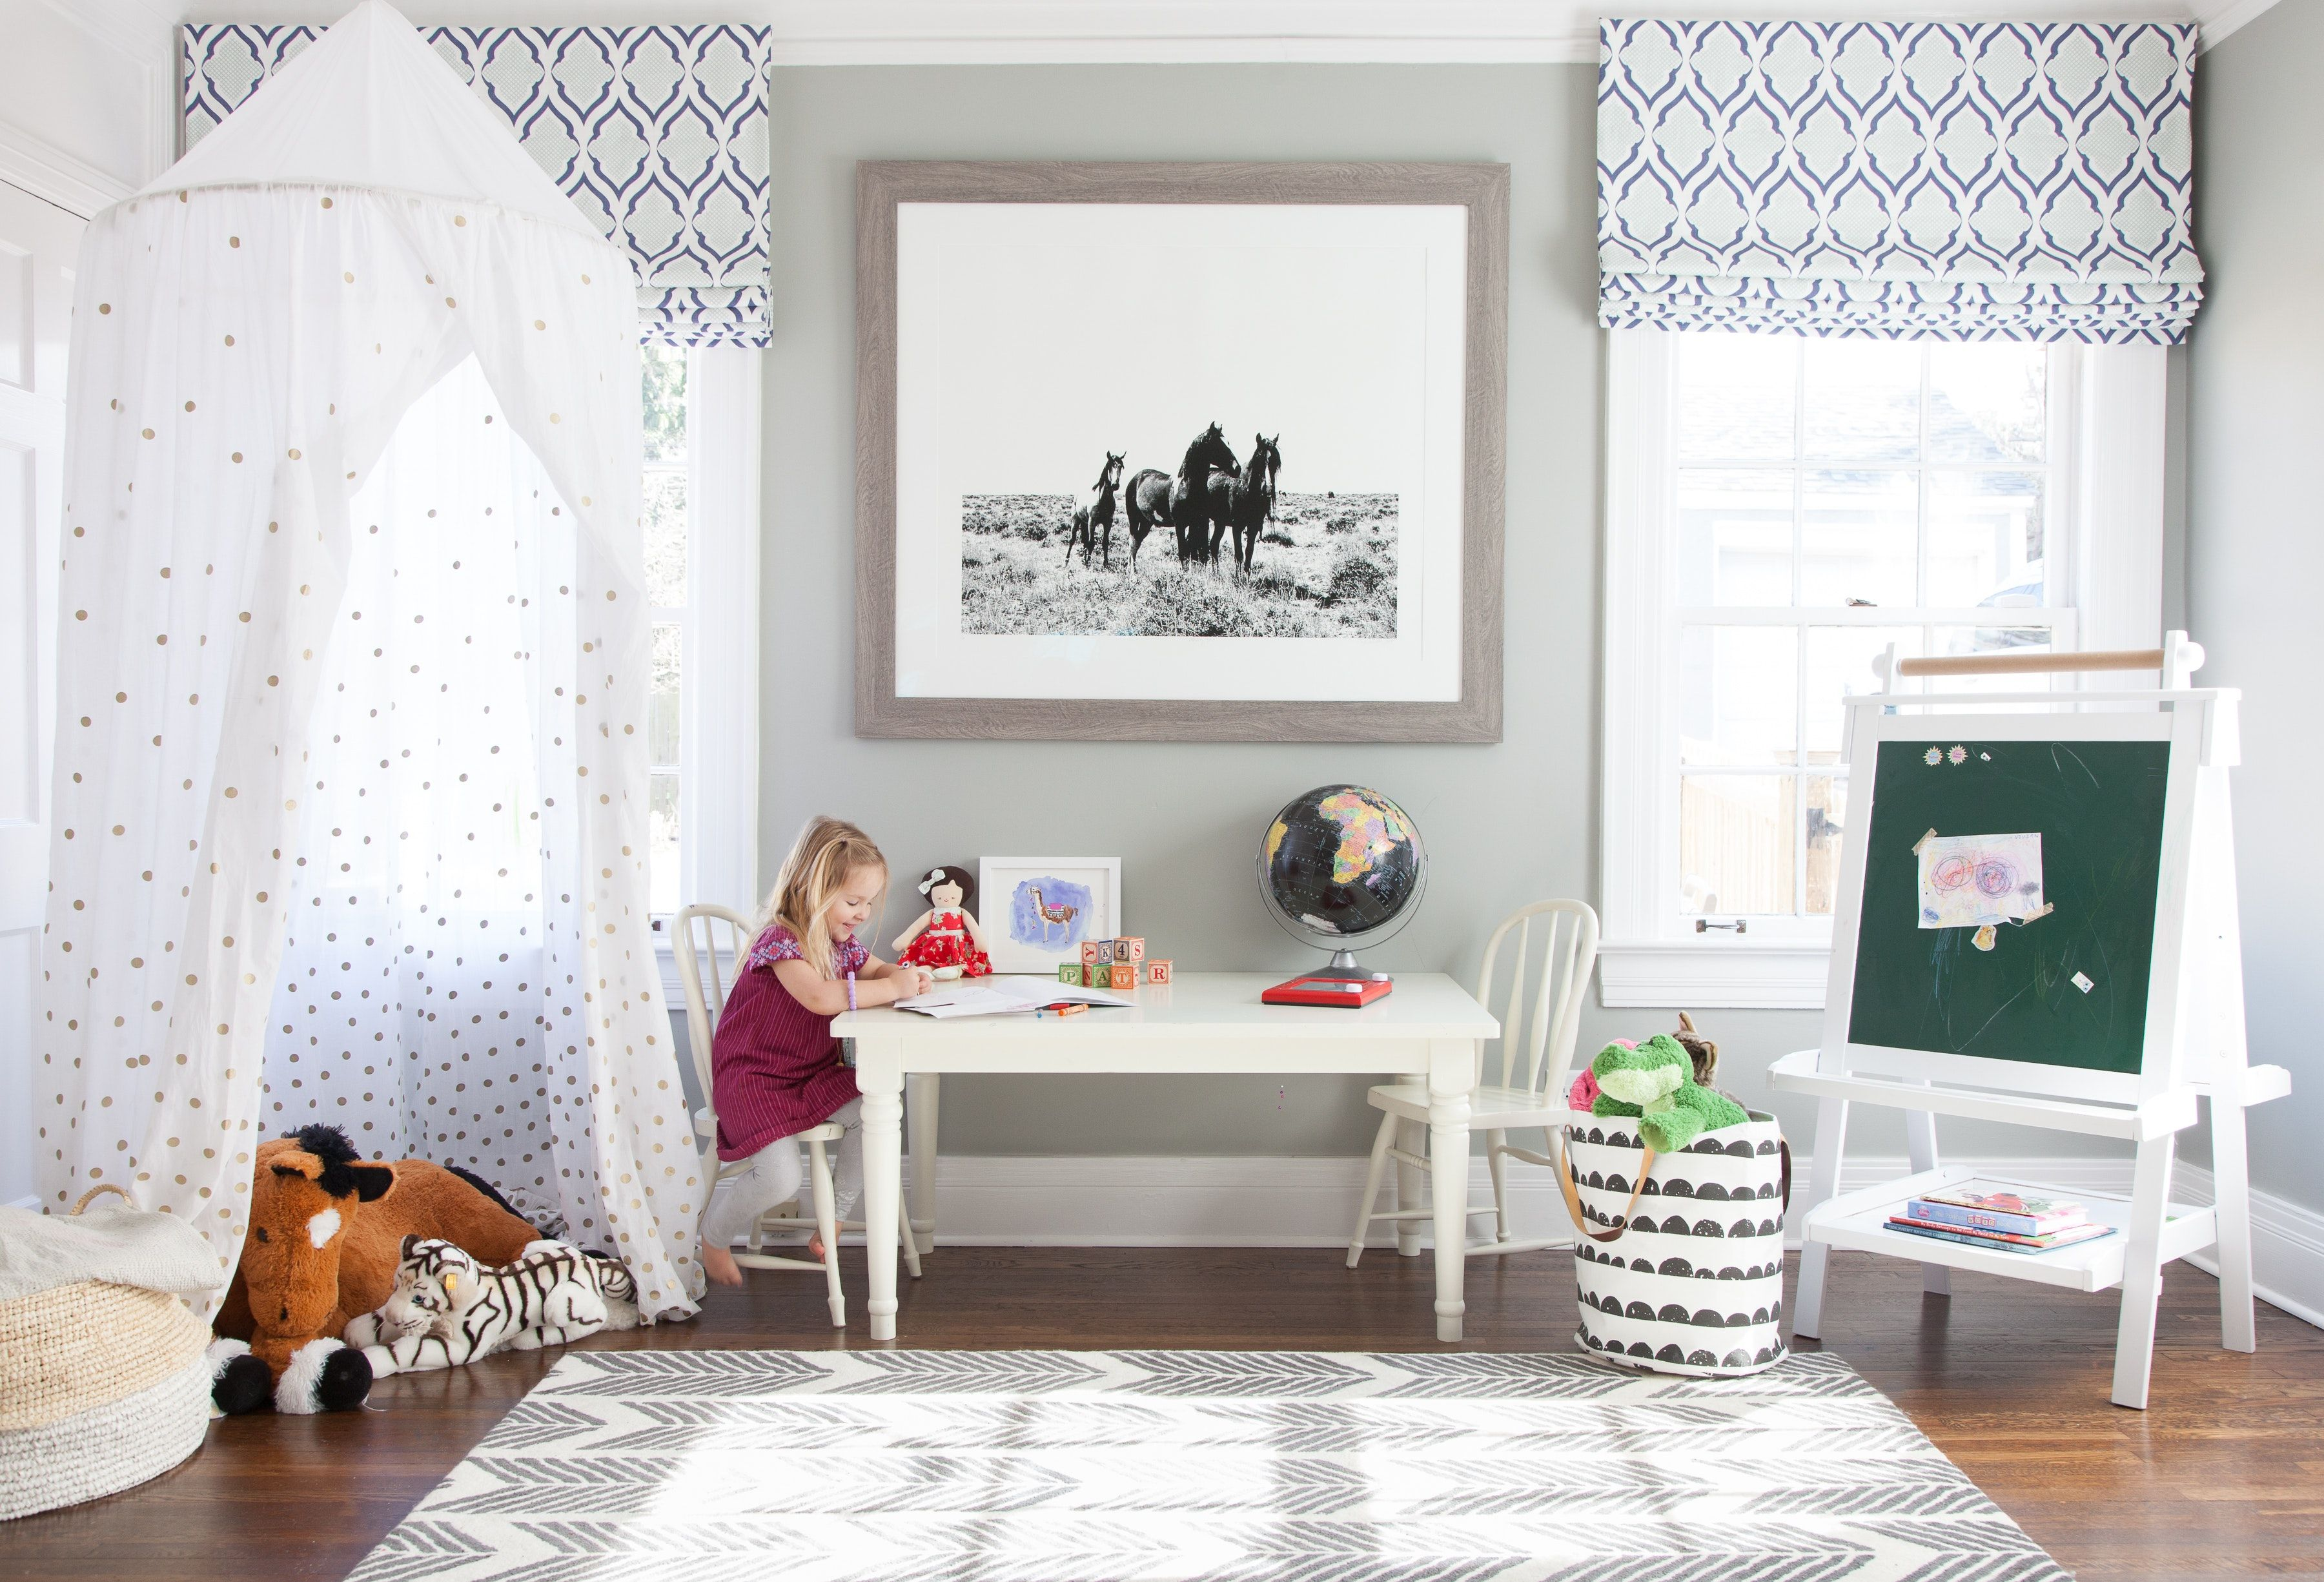 Kids Playroom Nashville Tn Large Scale Framed Black White Photography In 2020 Kid Room Style Kids Playroom Decor Kids Playroom